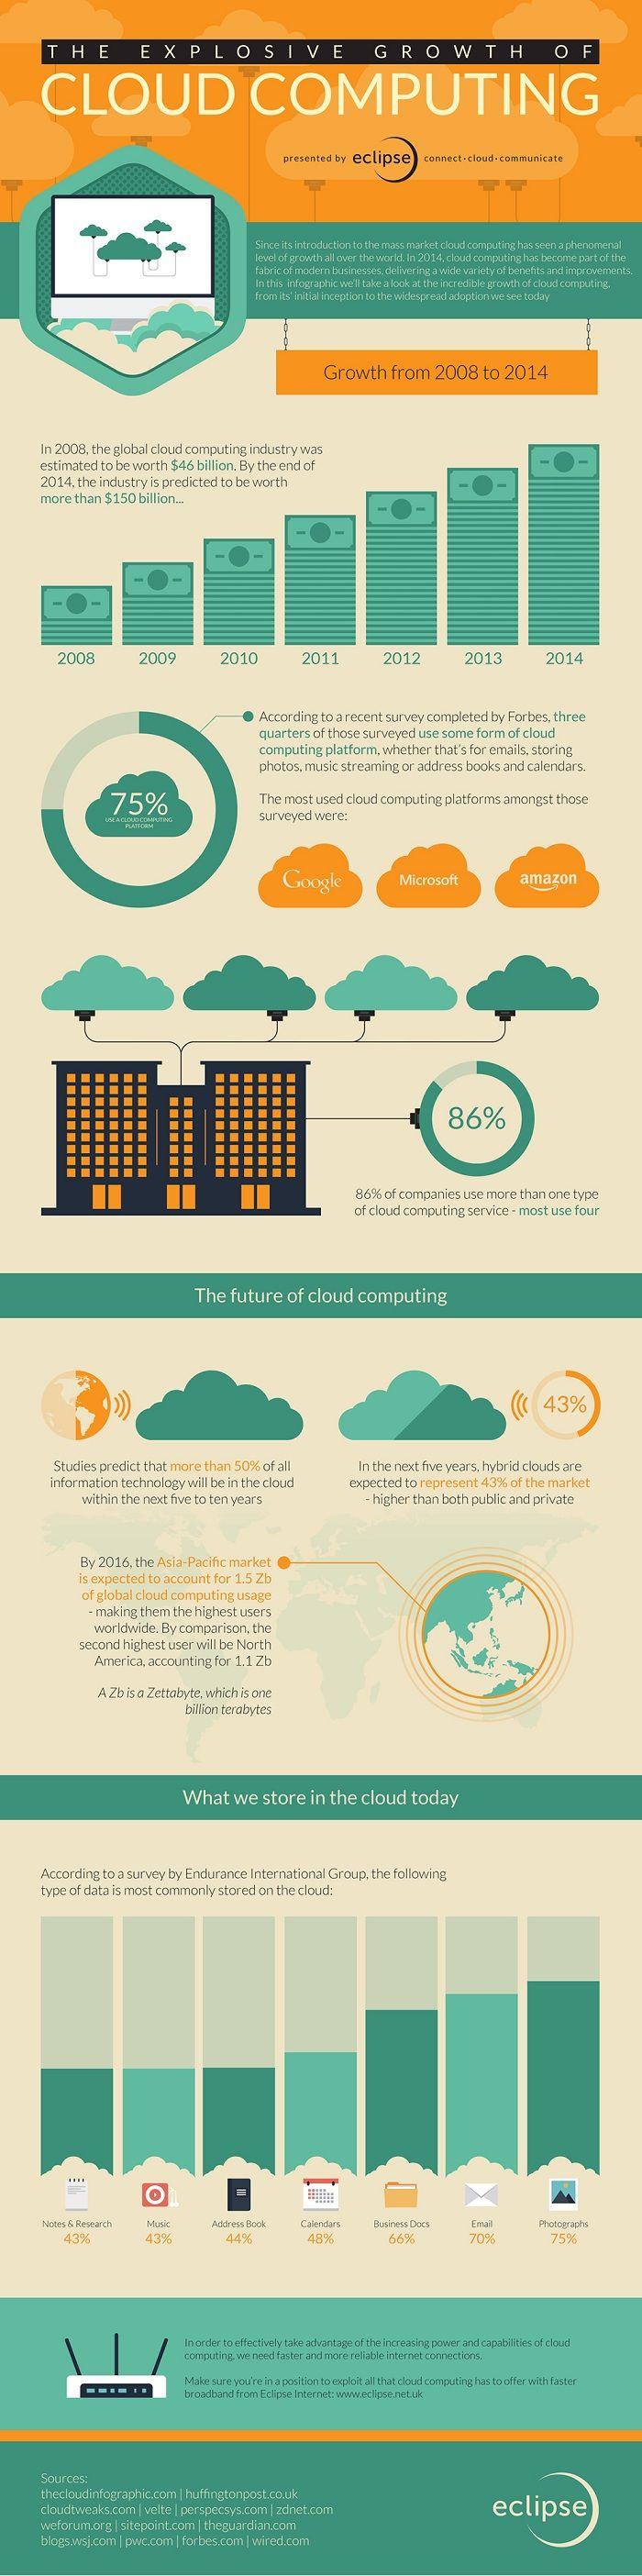 #cloudcomputing #healthit